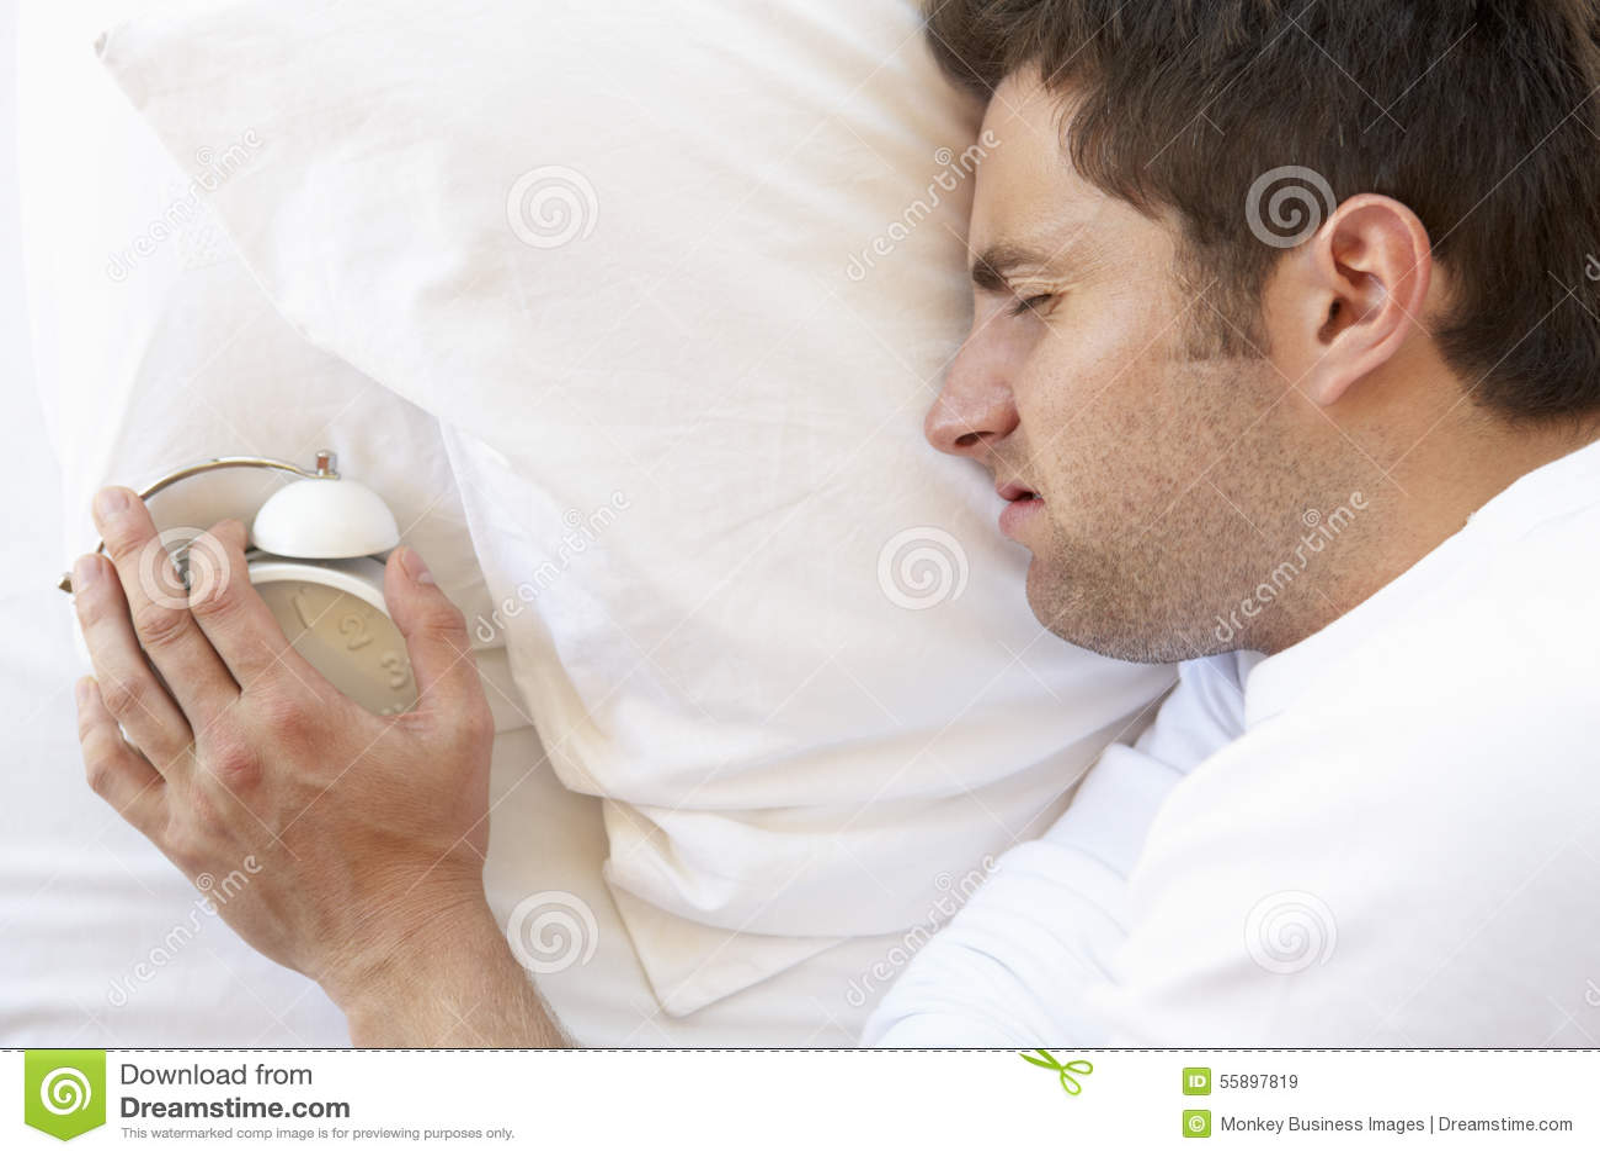 Grumpy Man In Bed Turning Off Alarm Clock Stock Image